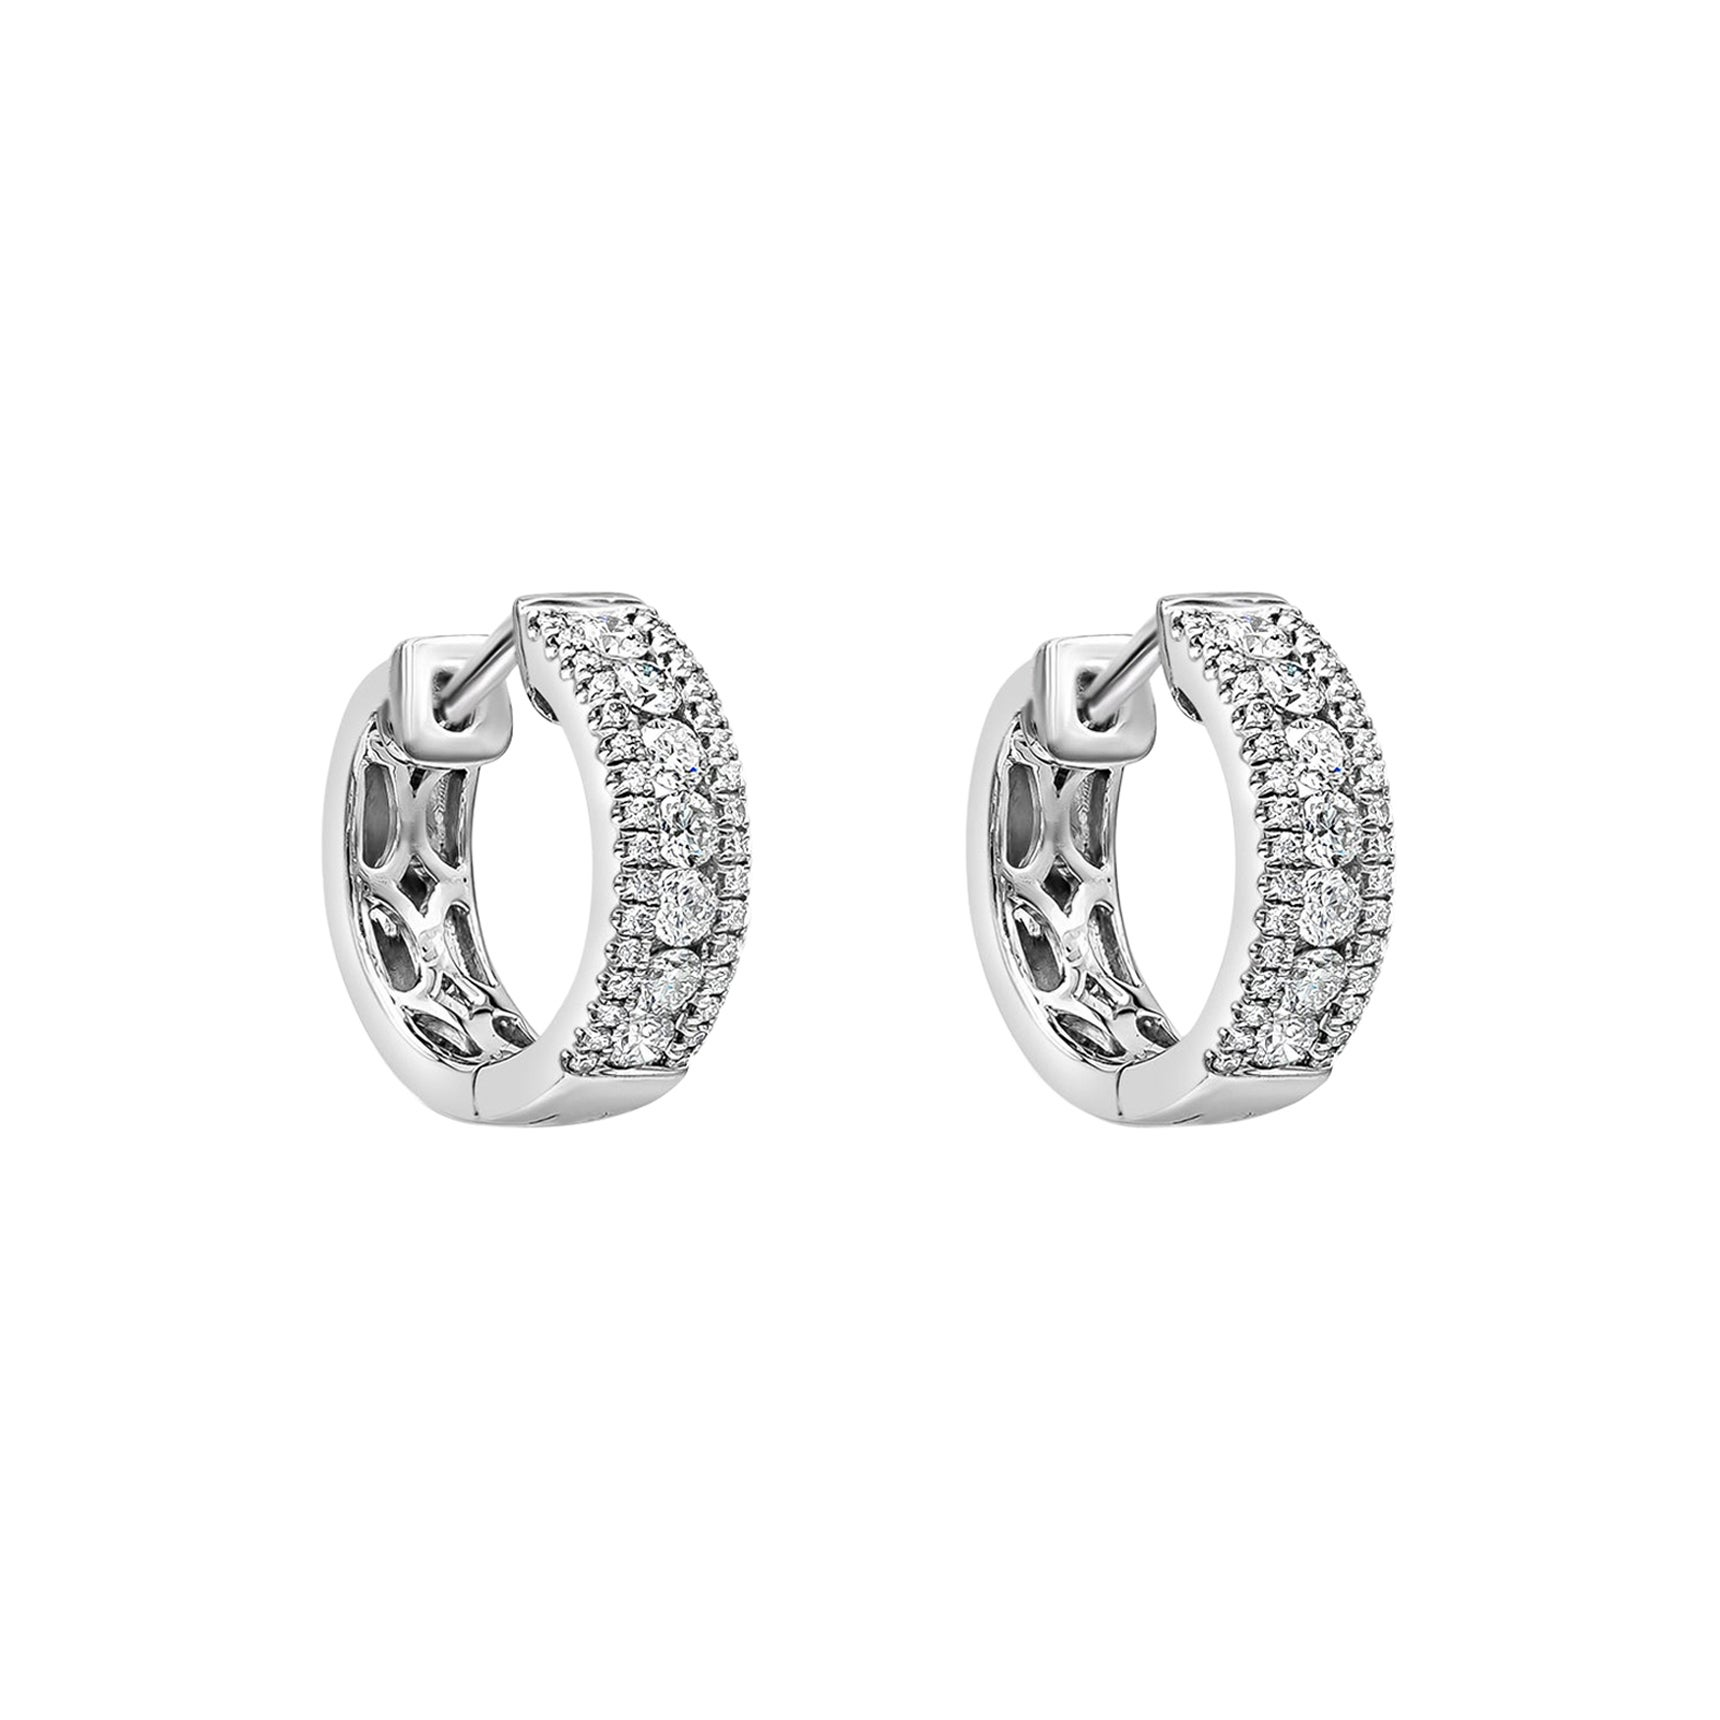 Roman Malakov 0.63 Carat Round Diamond Huggie Hoop Earrings